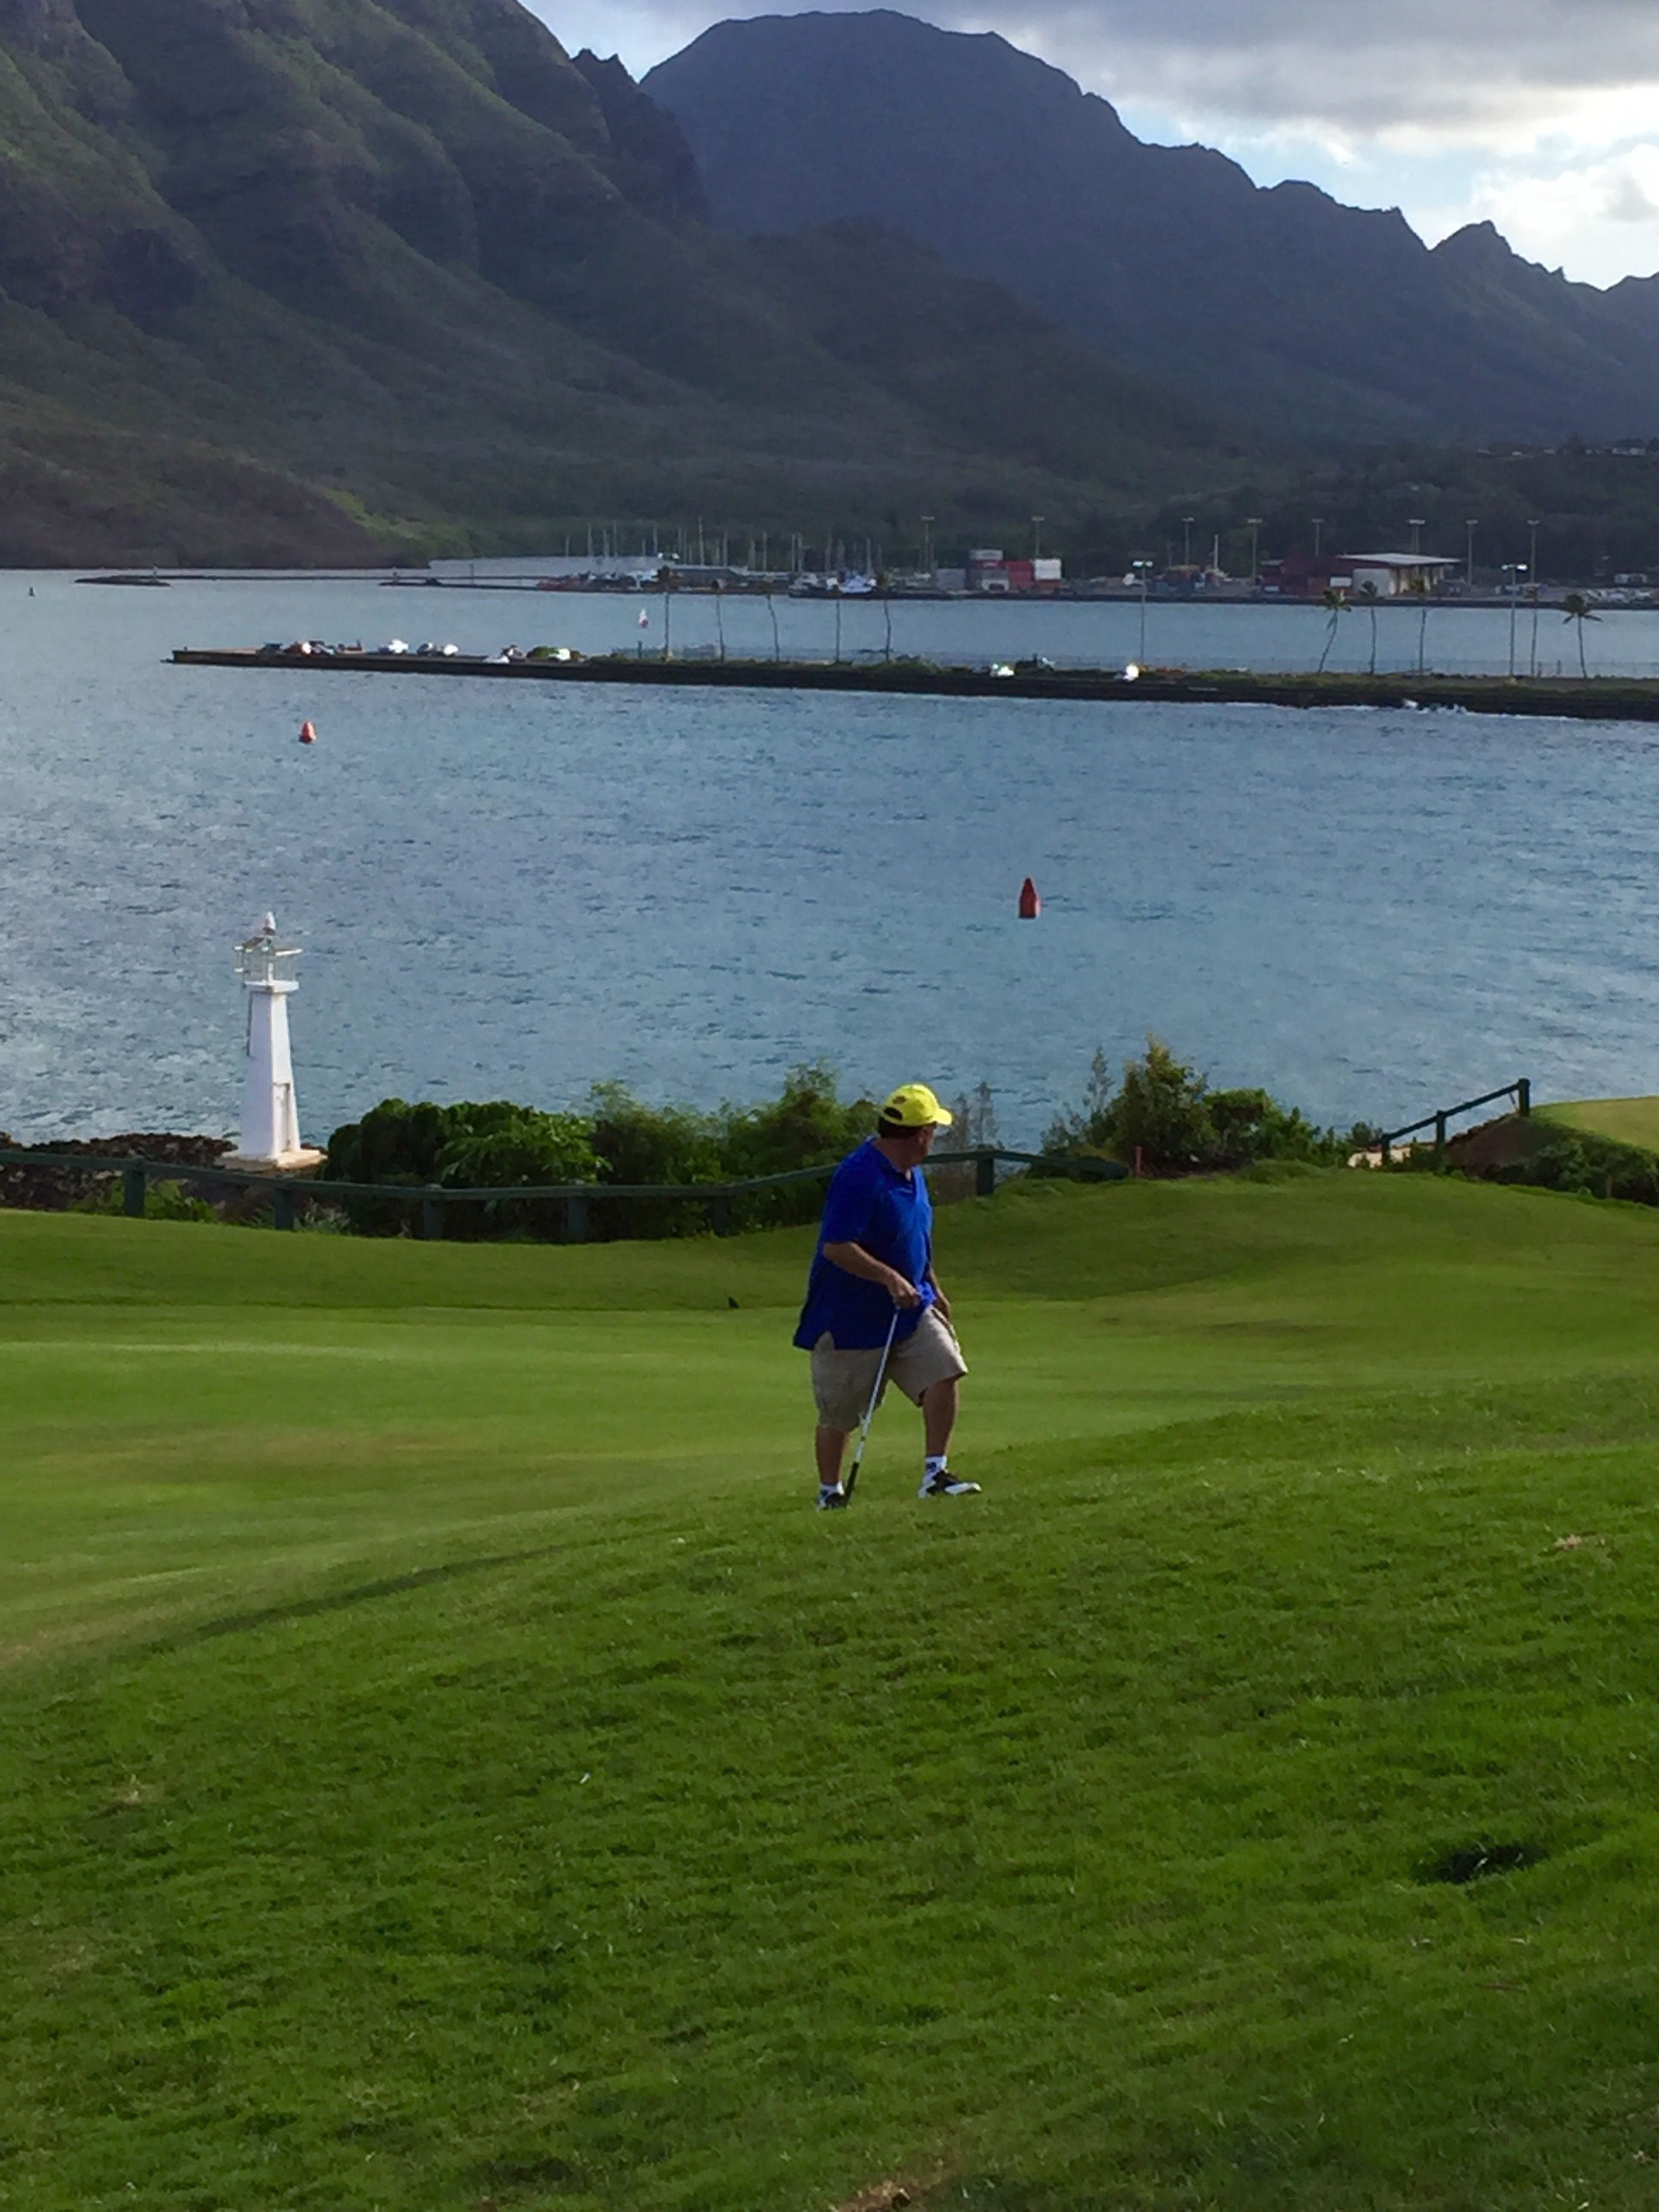 Ocean Golf Course Lihue kauai ⛳️